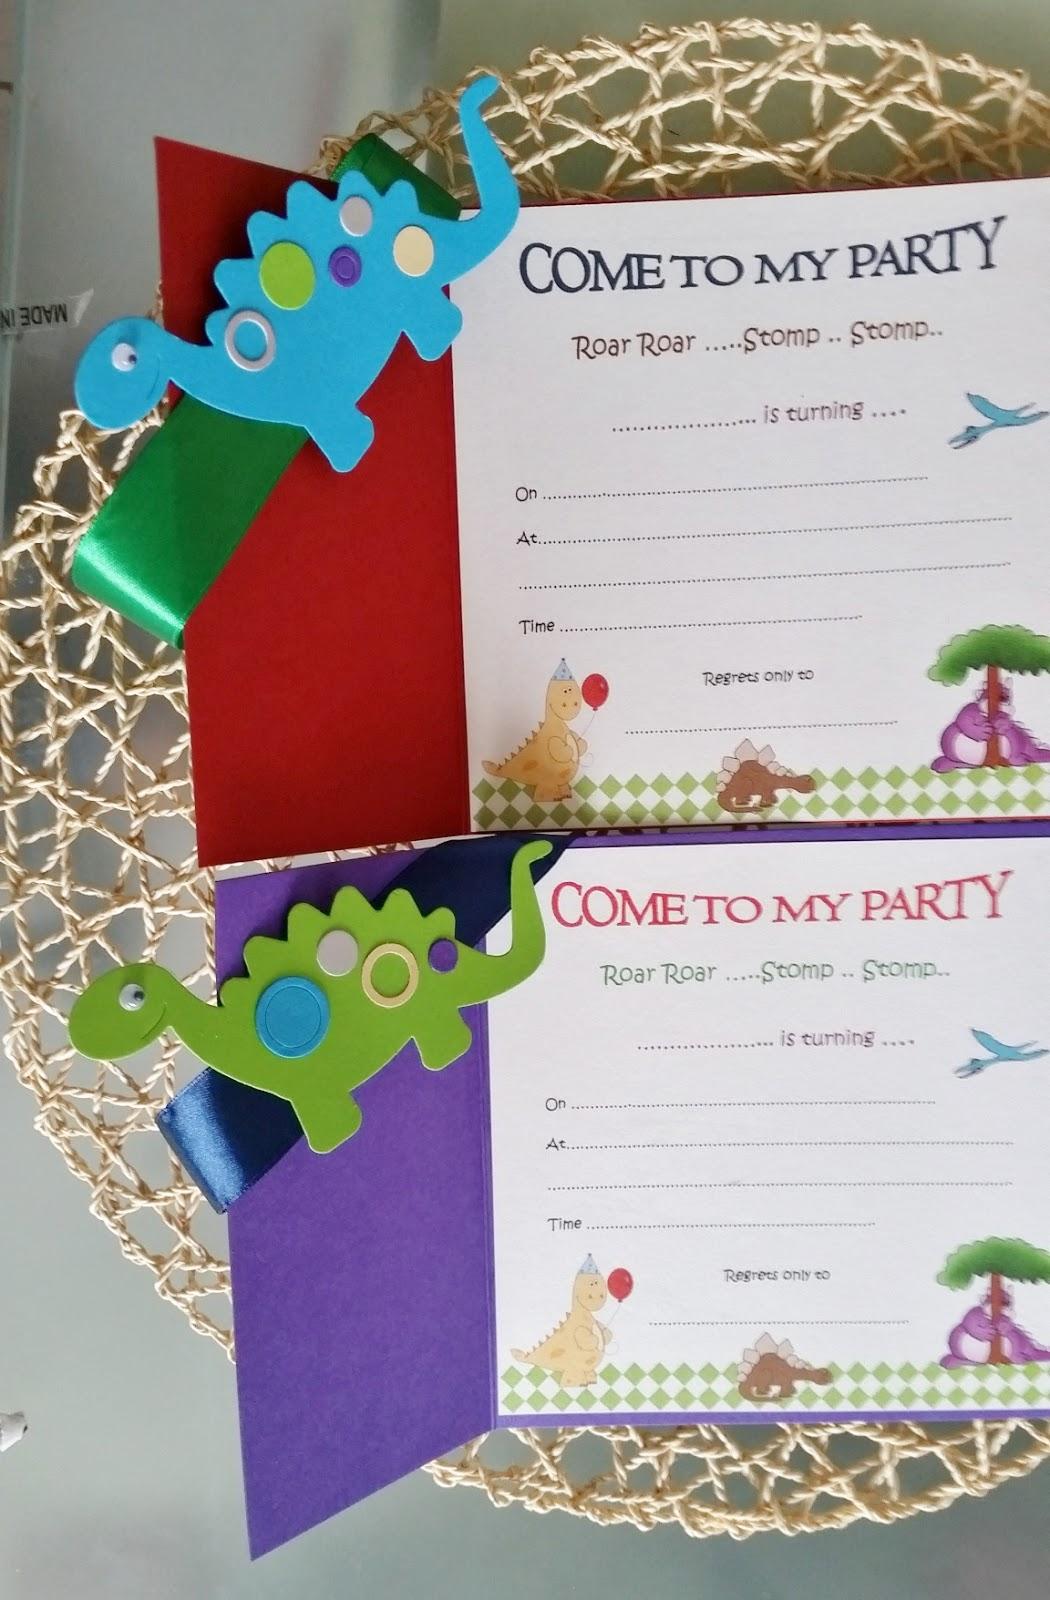 LK\'s Invitations and Wedding Stationary 00971 50 466 8096